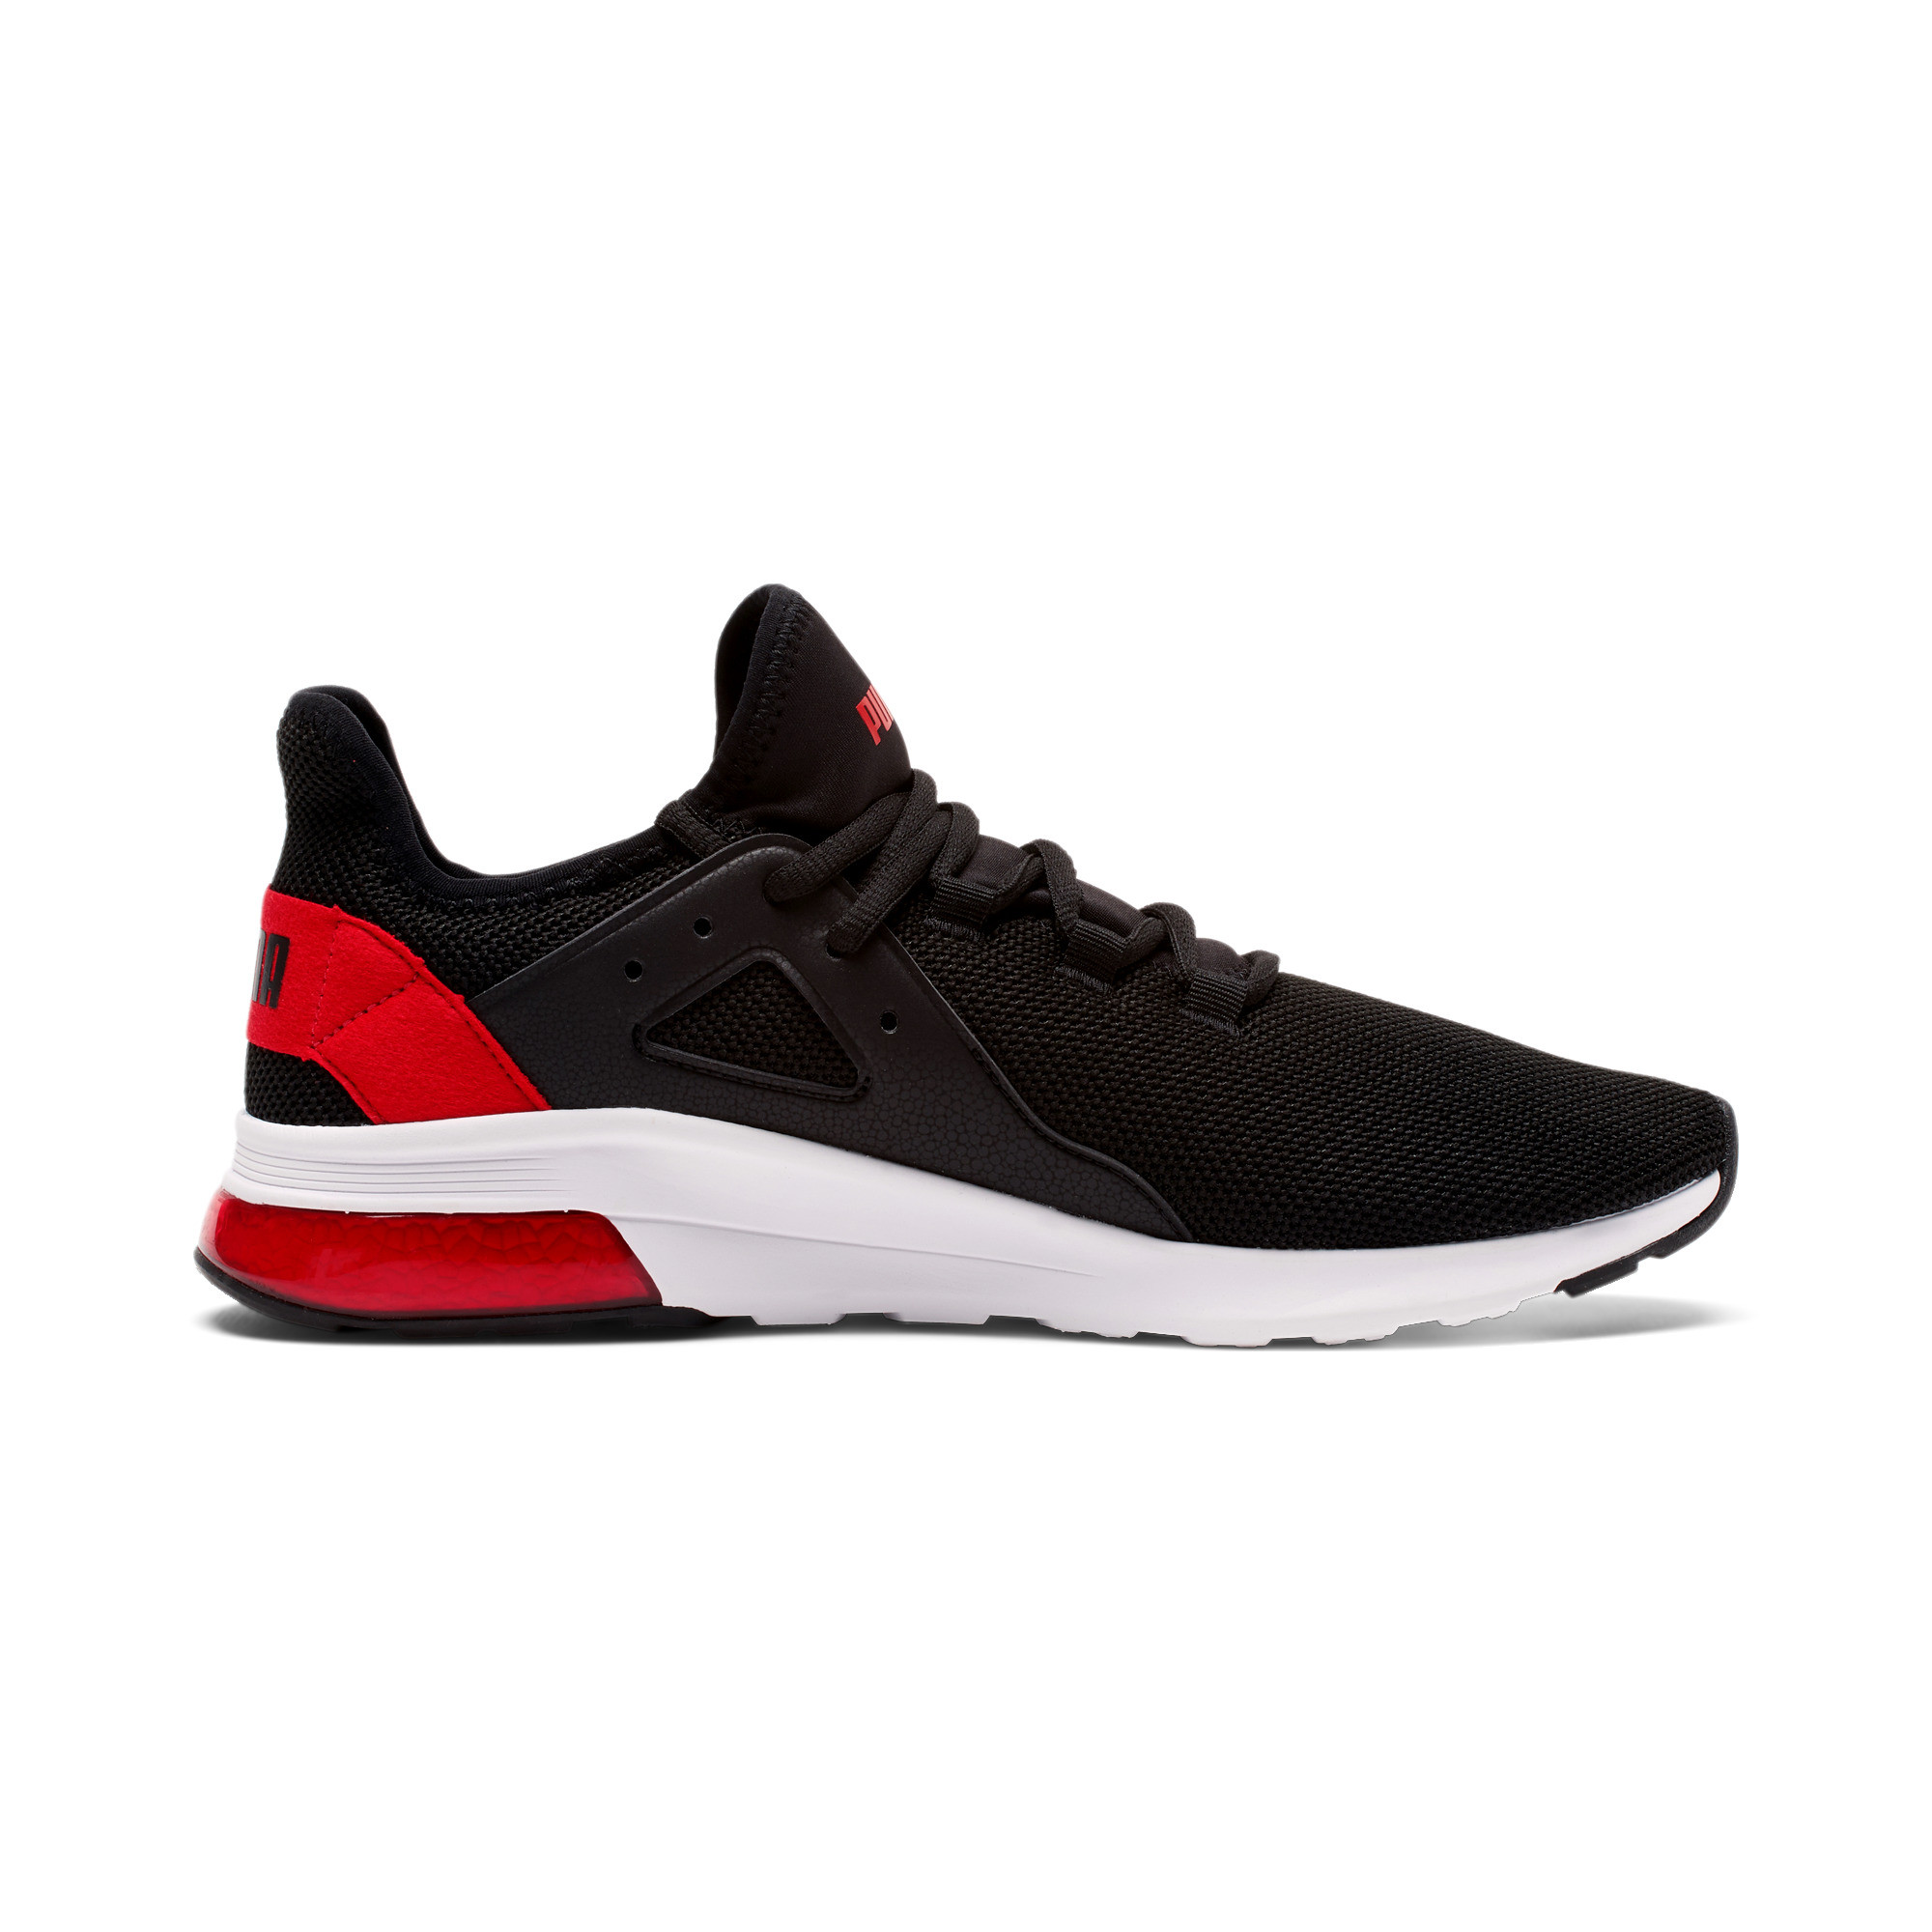 PUMA-Men-039-s-Electron-Street-Sneakers thumbnail 21